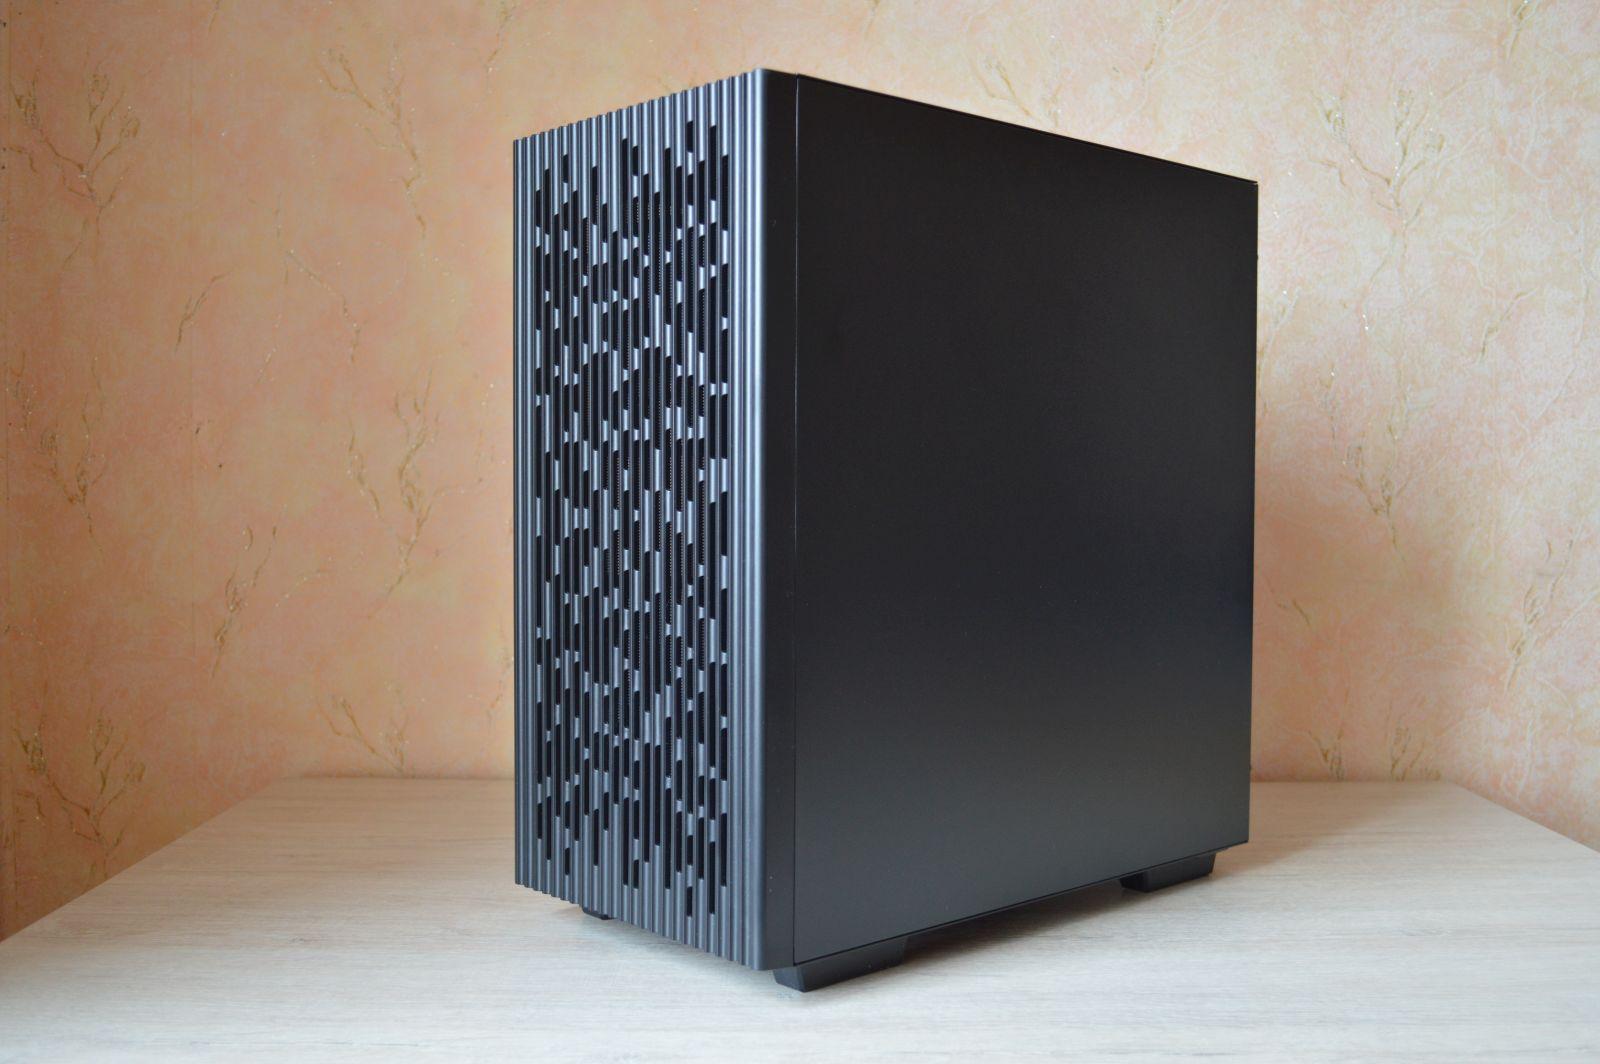 Deepcool Matrexx 40 3FS сбоку